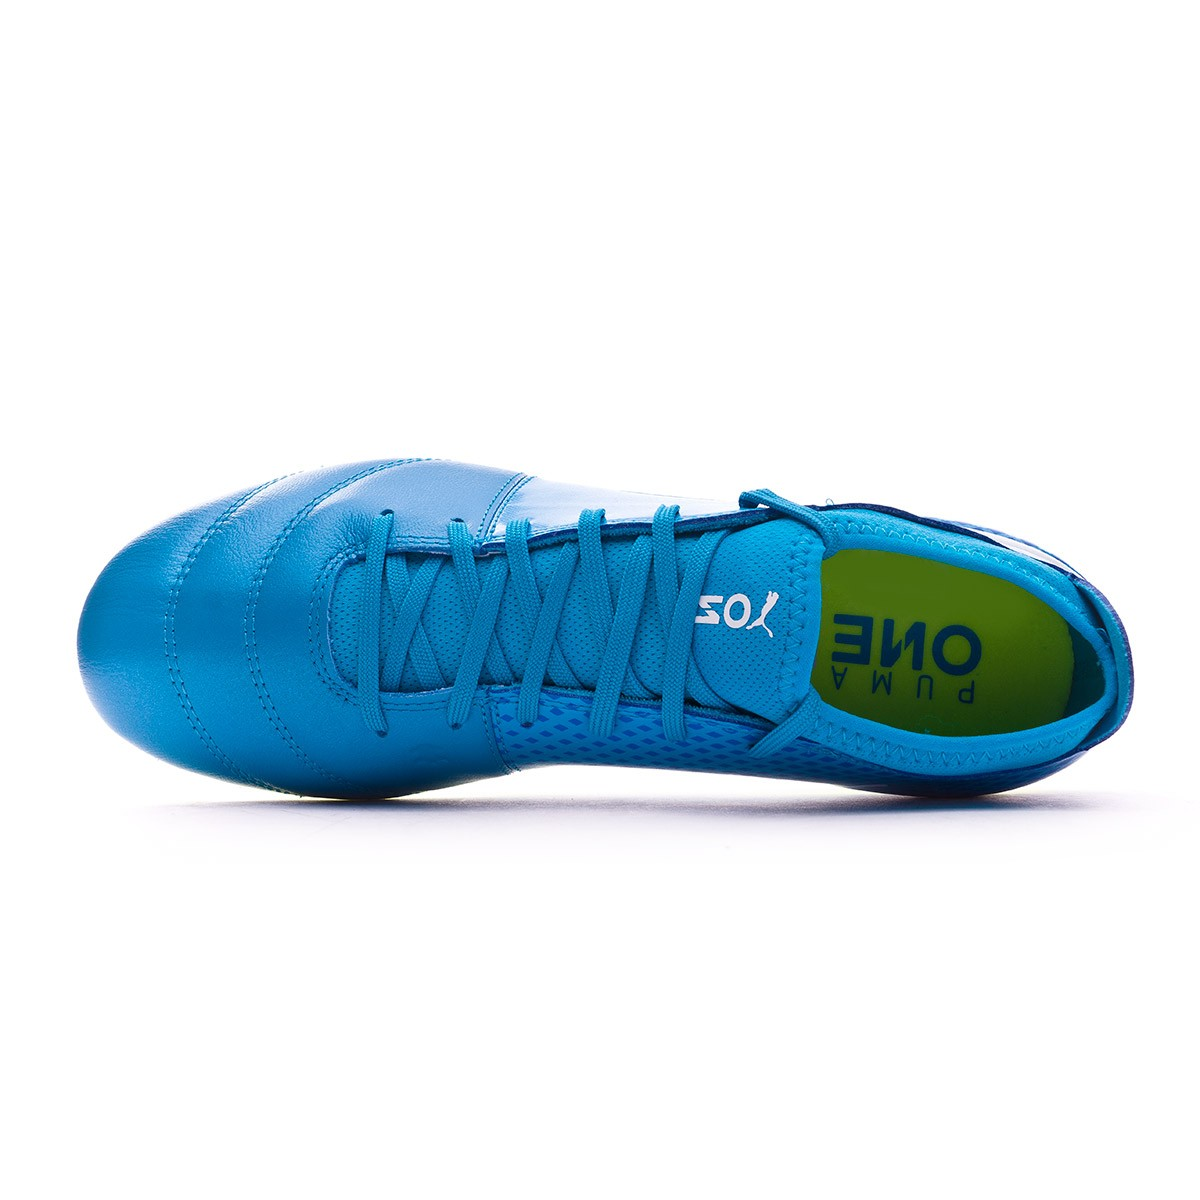 39c2cc4c0da Football Boots Puma One 17.3 AG Atomic blue-Puma white-Safety yellow -  Football store Fútbol Emotion